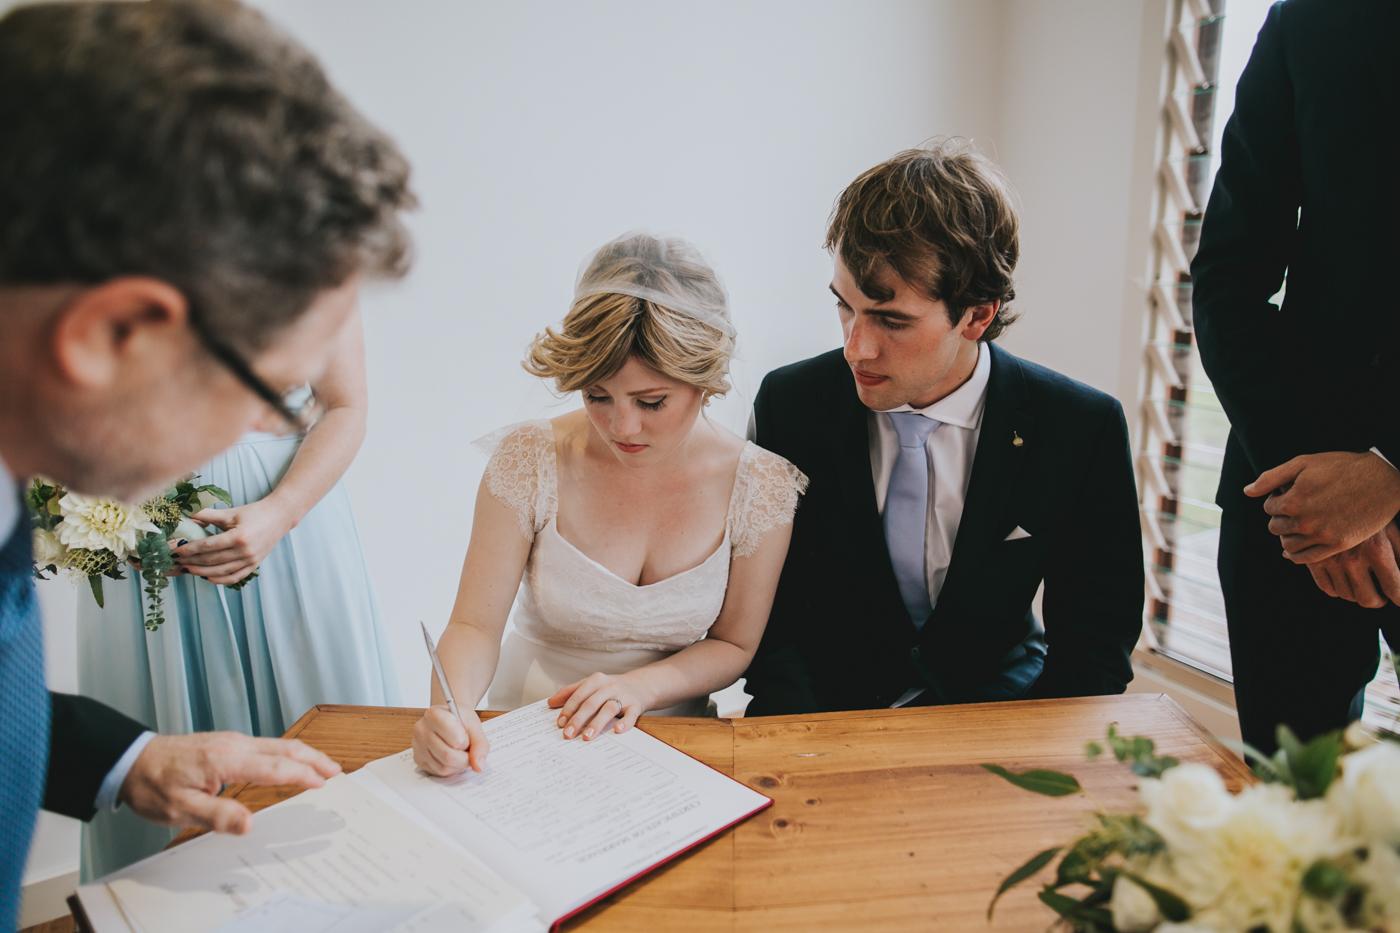 Rachel & Jacob - Willow Farm Berry - South Coast Wedding - Samantha Heather Photography-84.jpg